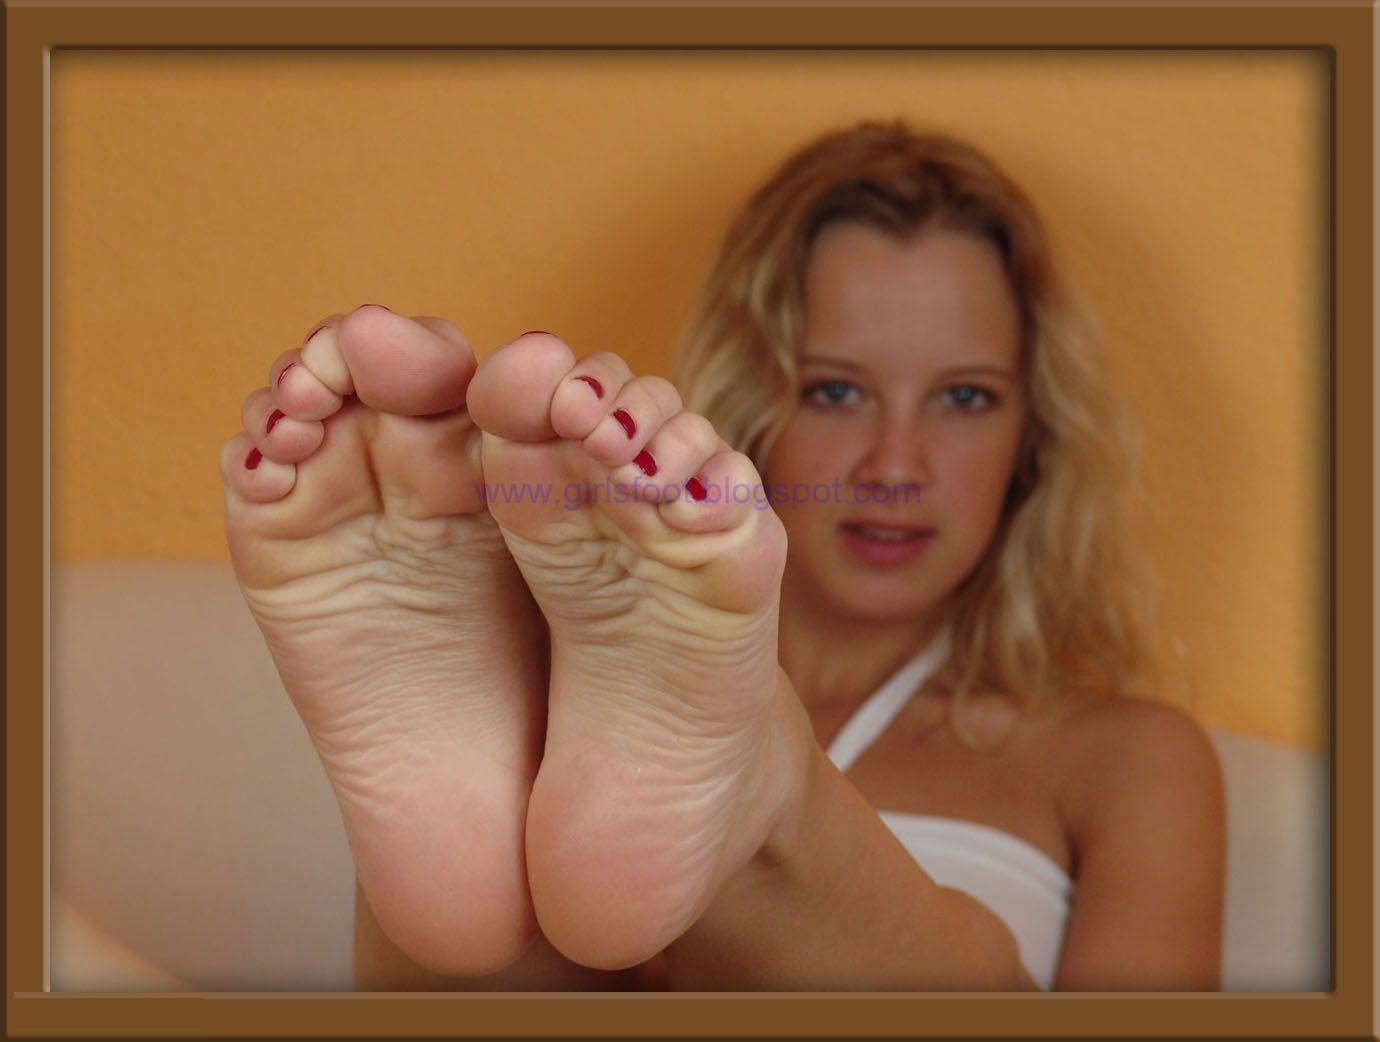 Footlover Footjob Beautiful Girl, Sexy Legs And Feet-1522